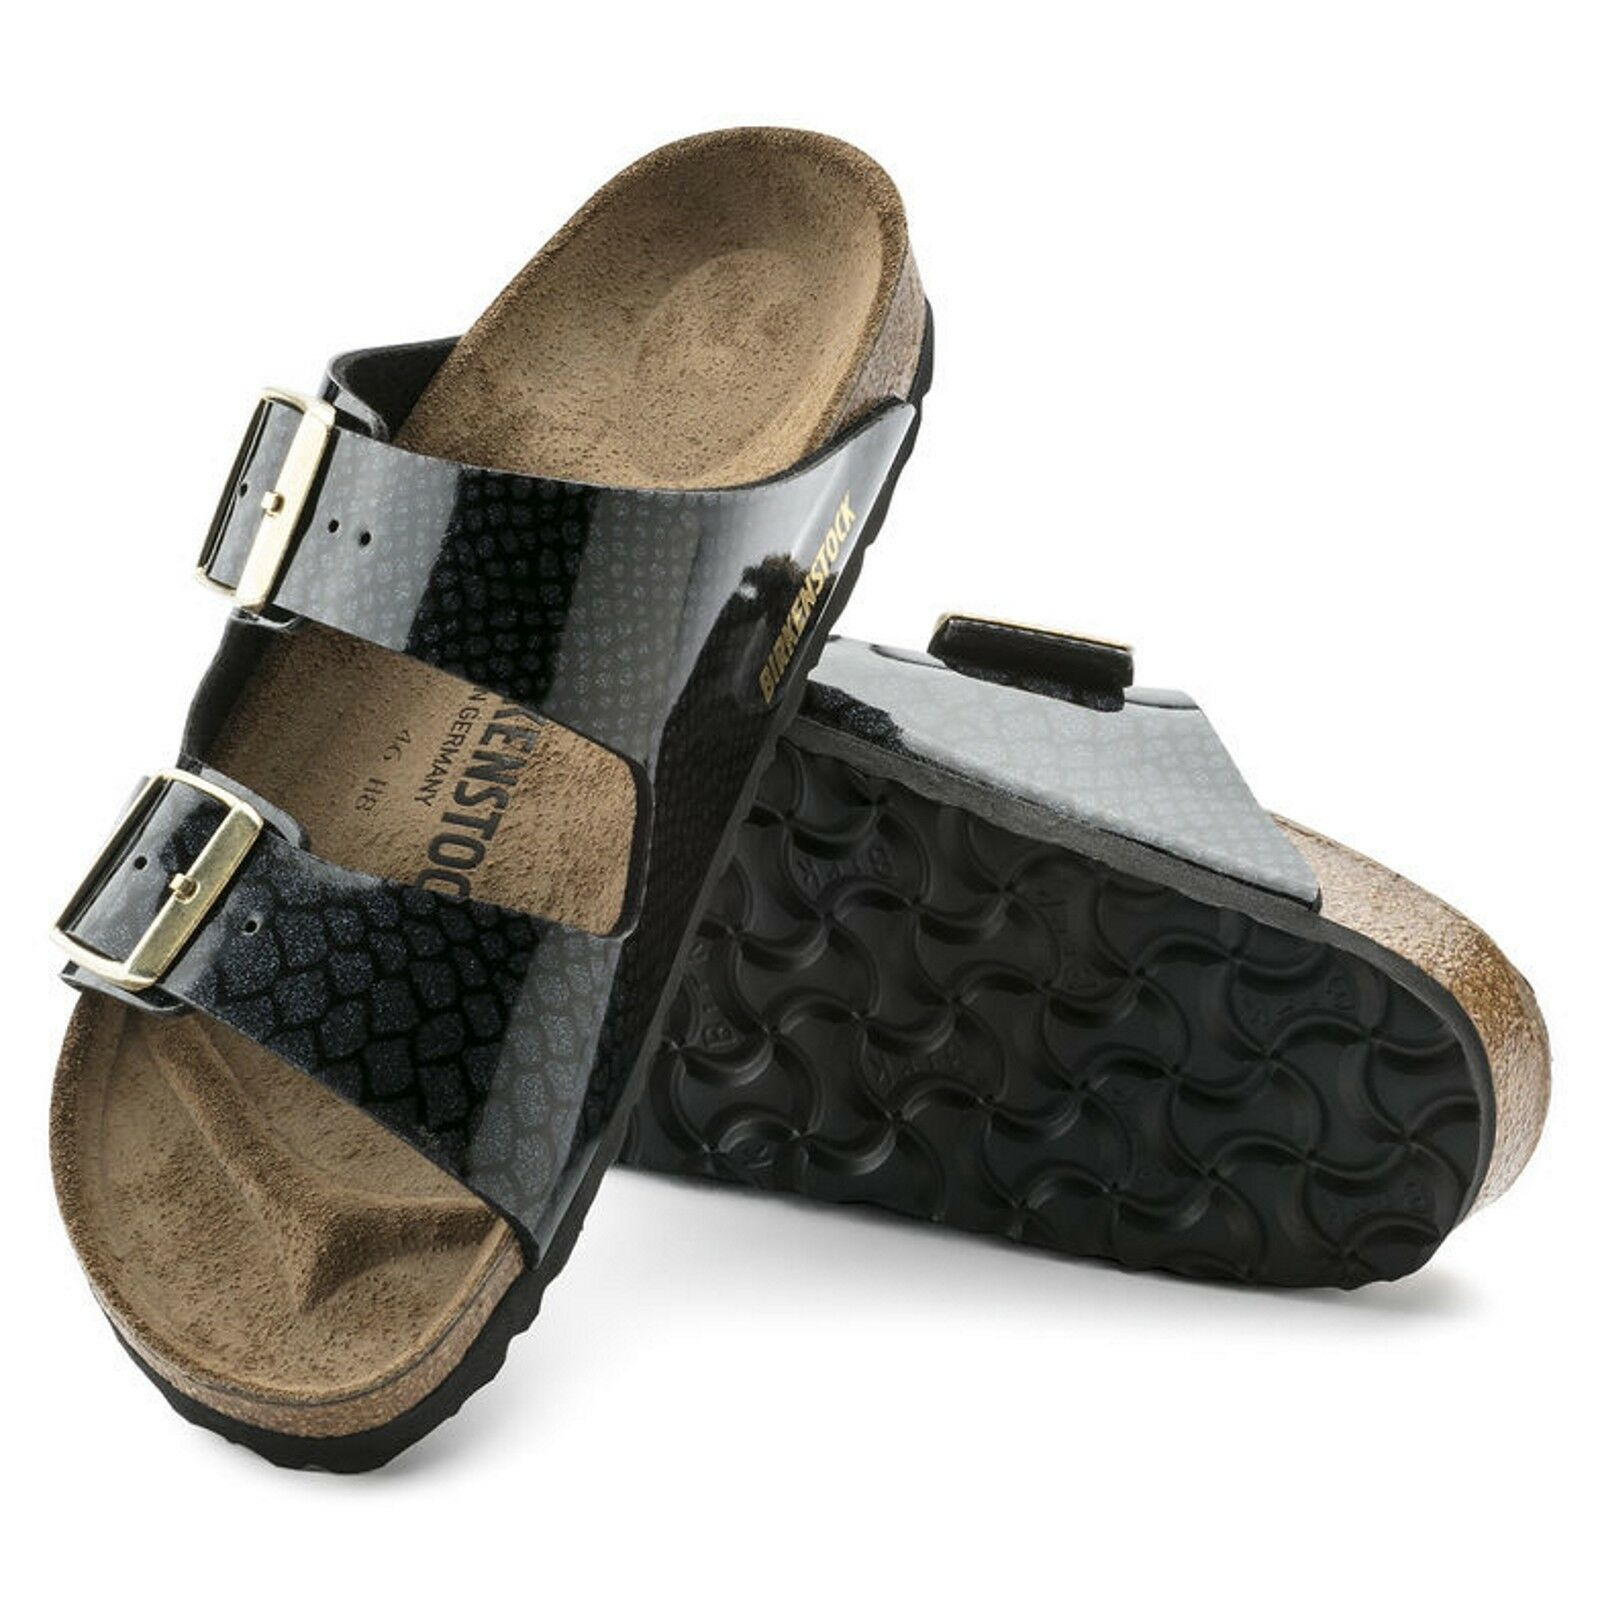 PLEASER Ankle Strap Platform Sandal Multi-size Rhinestone STARDUST-702 Silver